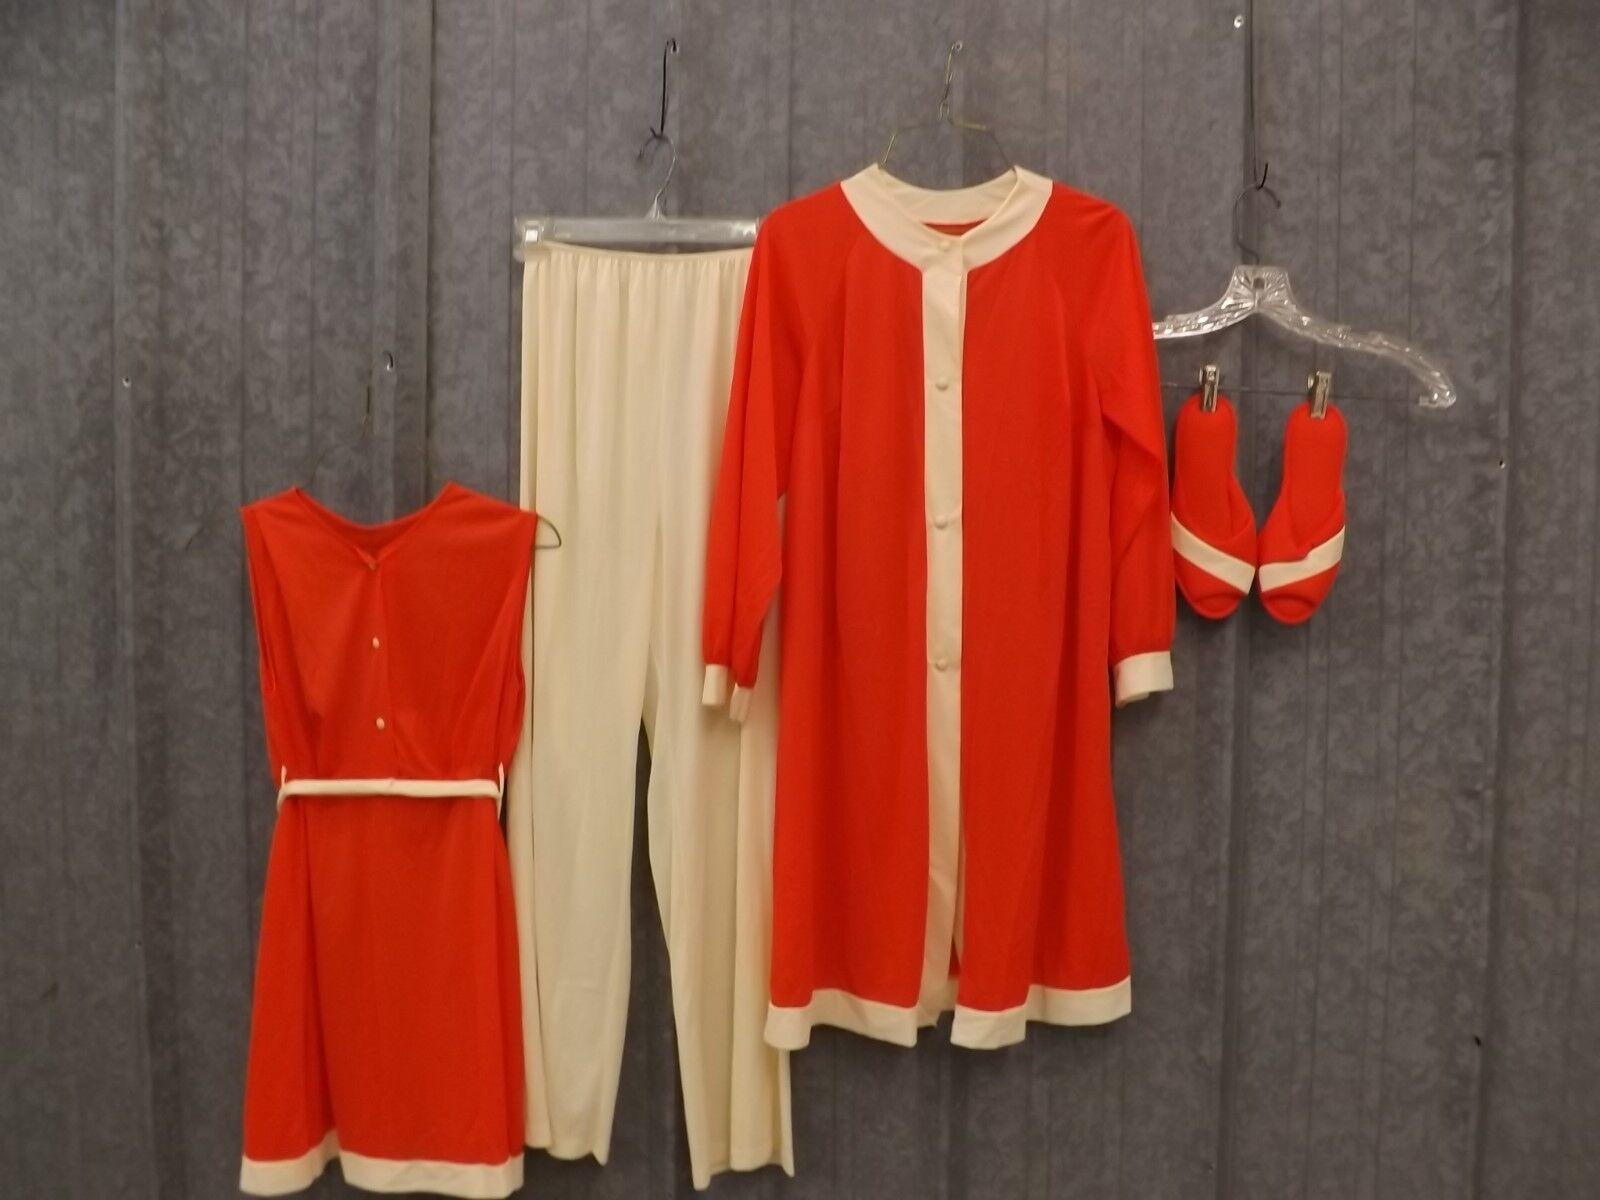 Classy Cool  Vtg 1960s NEW Sears Lounge Wear Pajamas Robe Slippers Set Sz S (34)